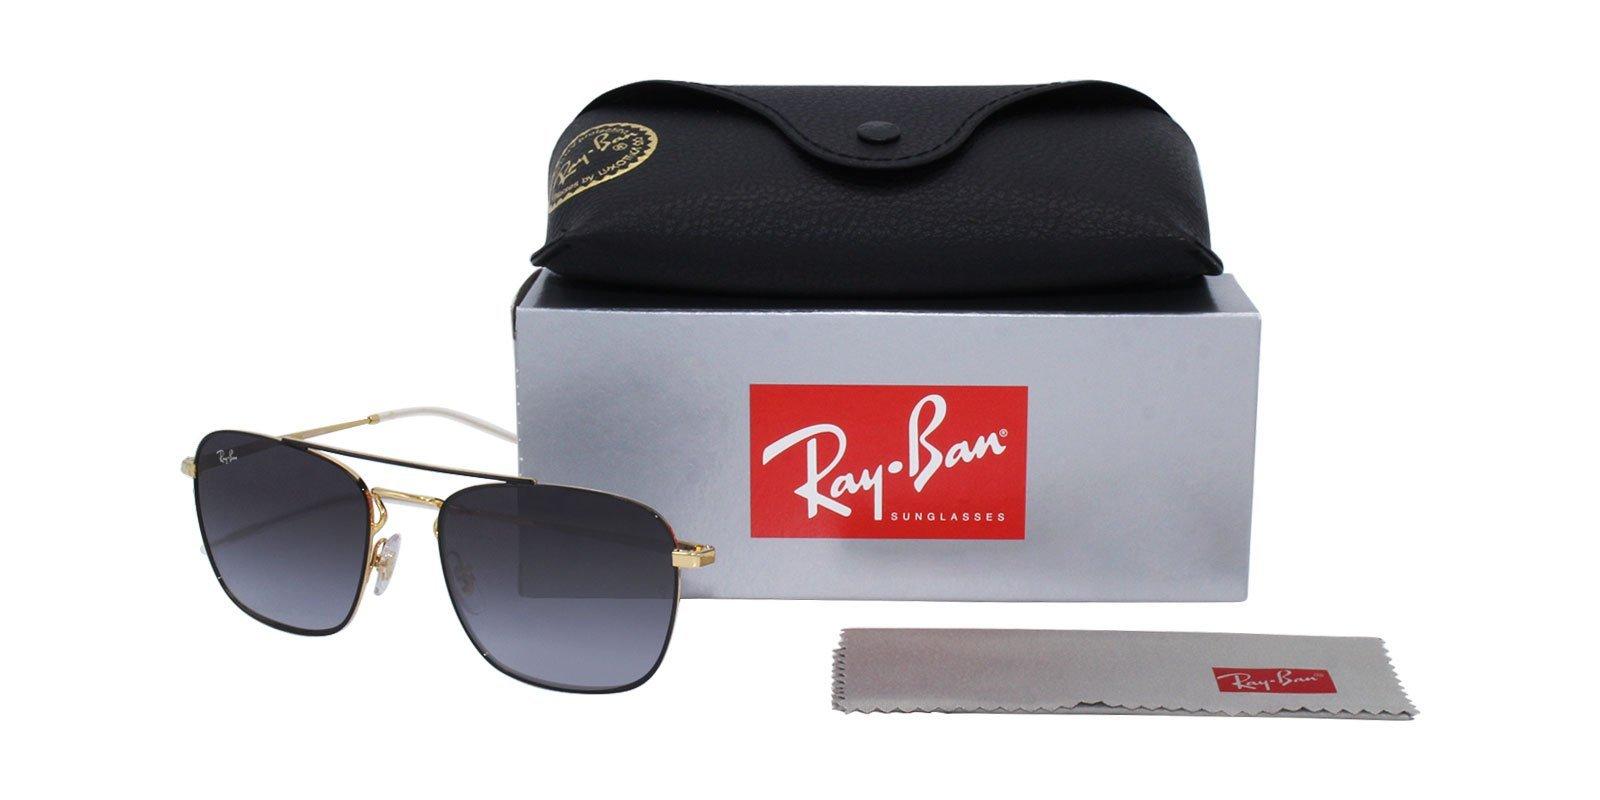 Ray-Ban RB3588 9054/8G 55-19  140 3N